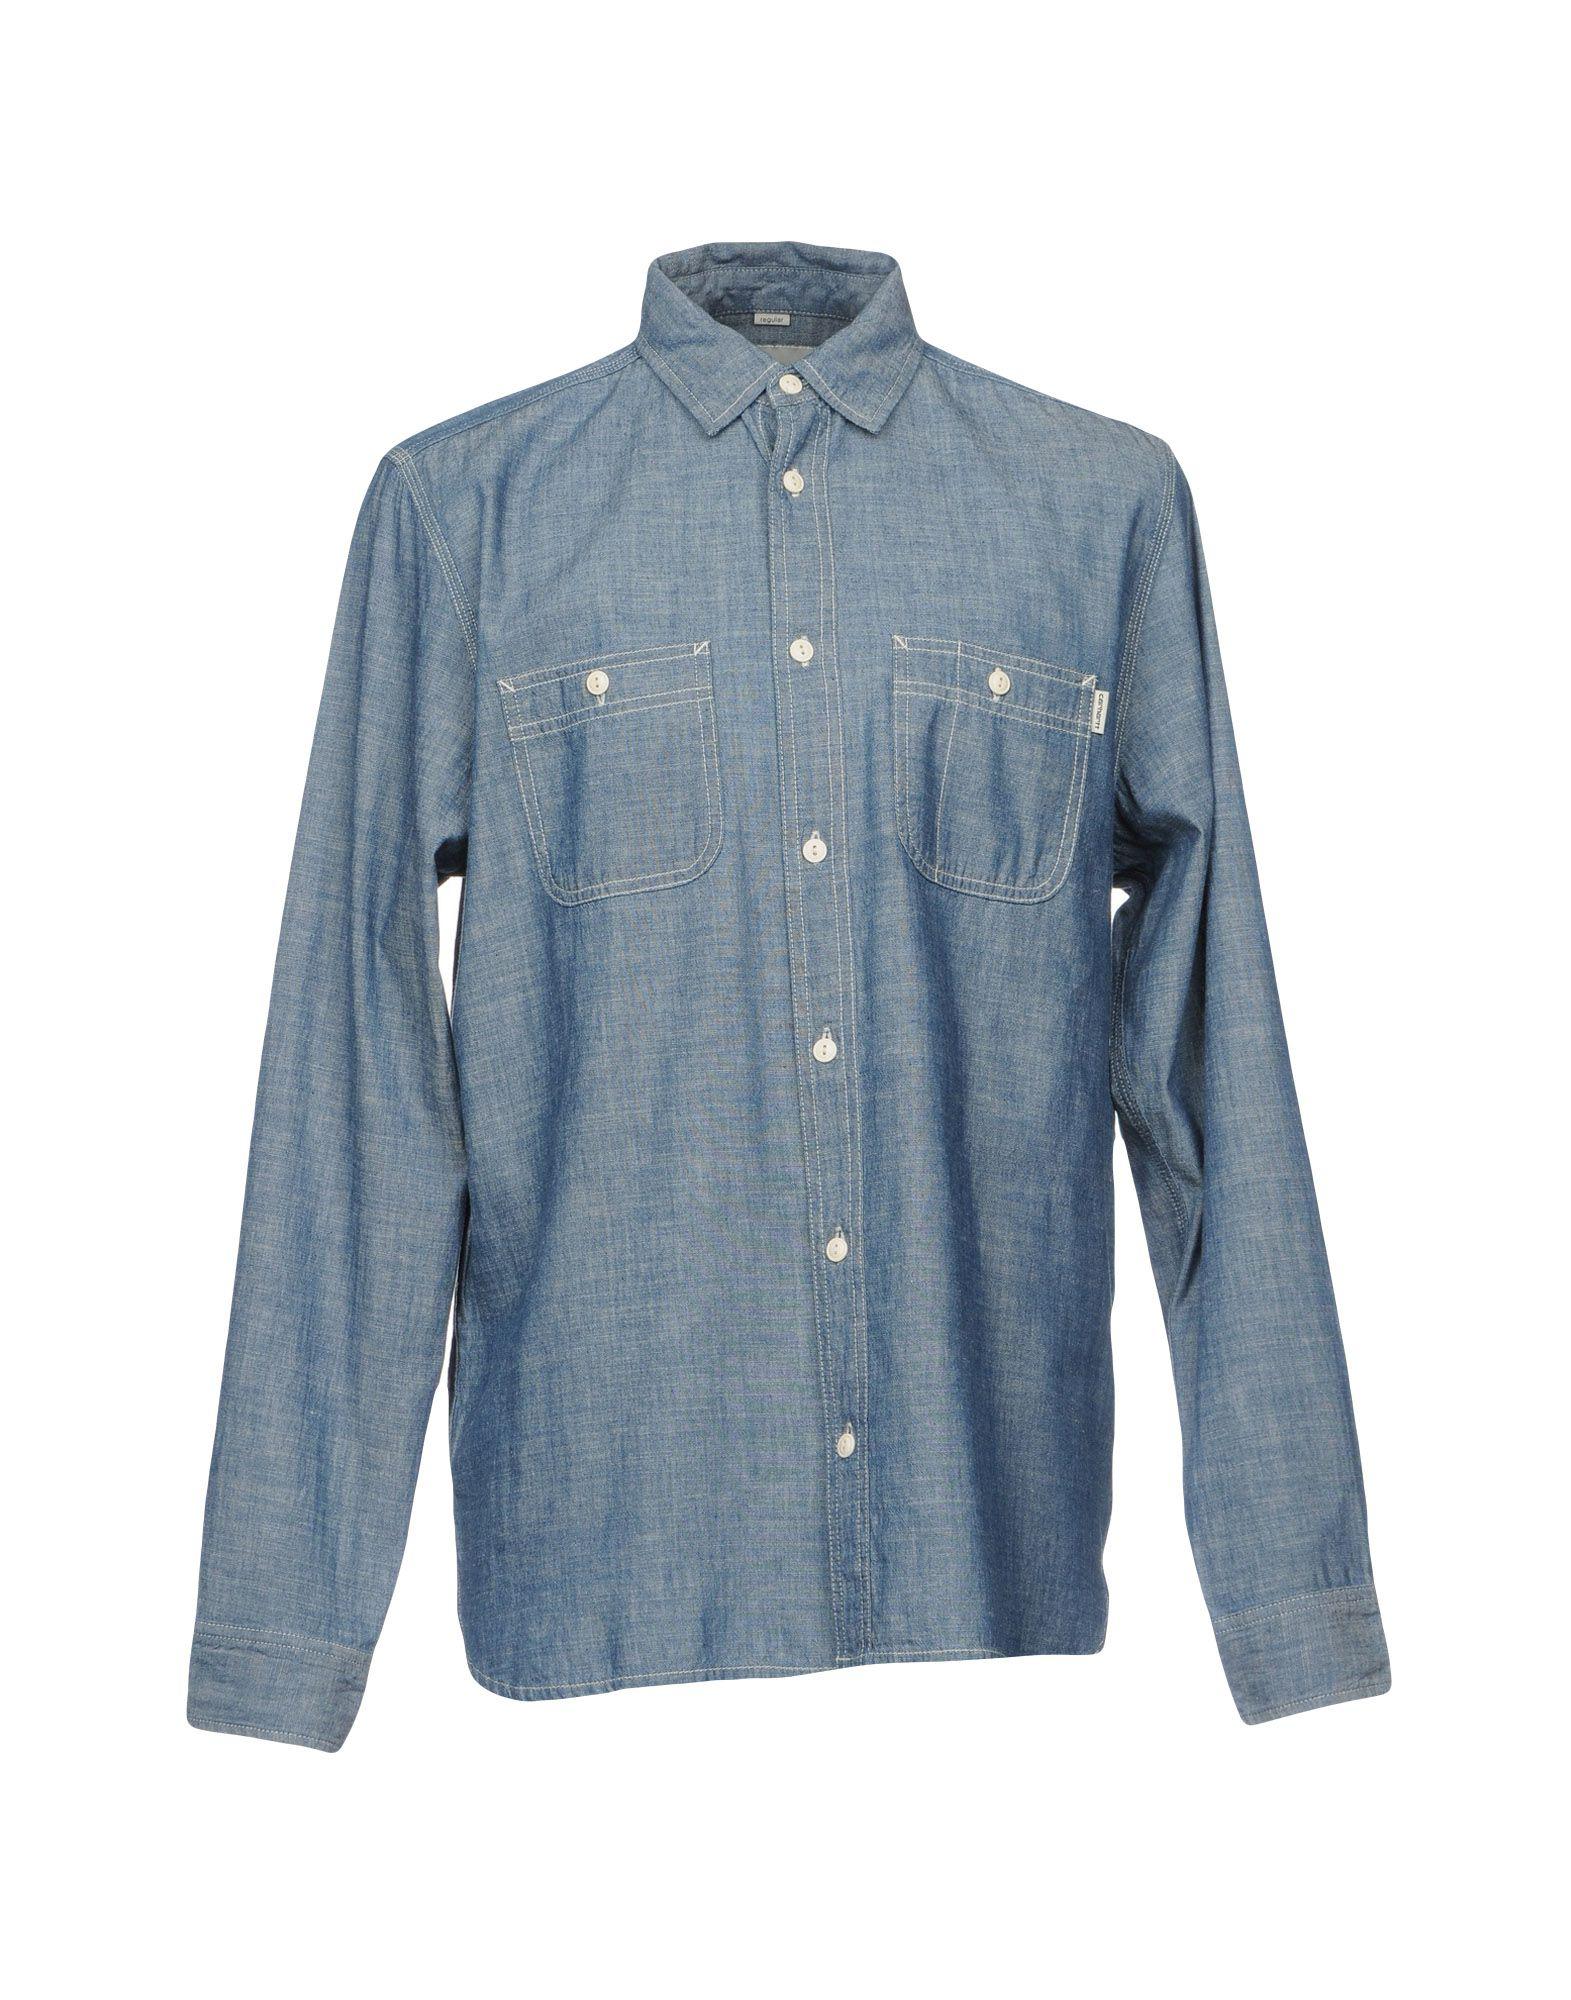 цена на CARHARTT Джинсовая рубашка